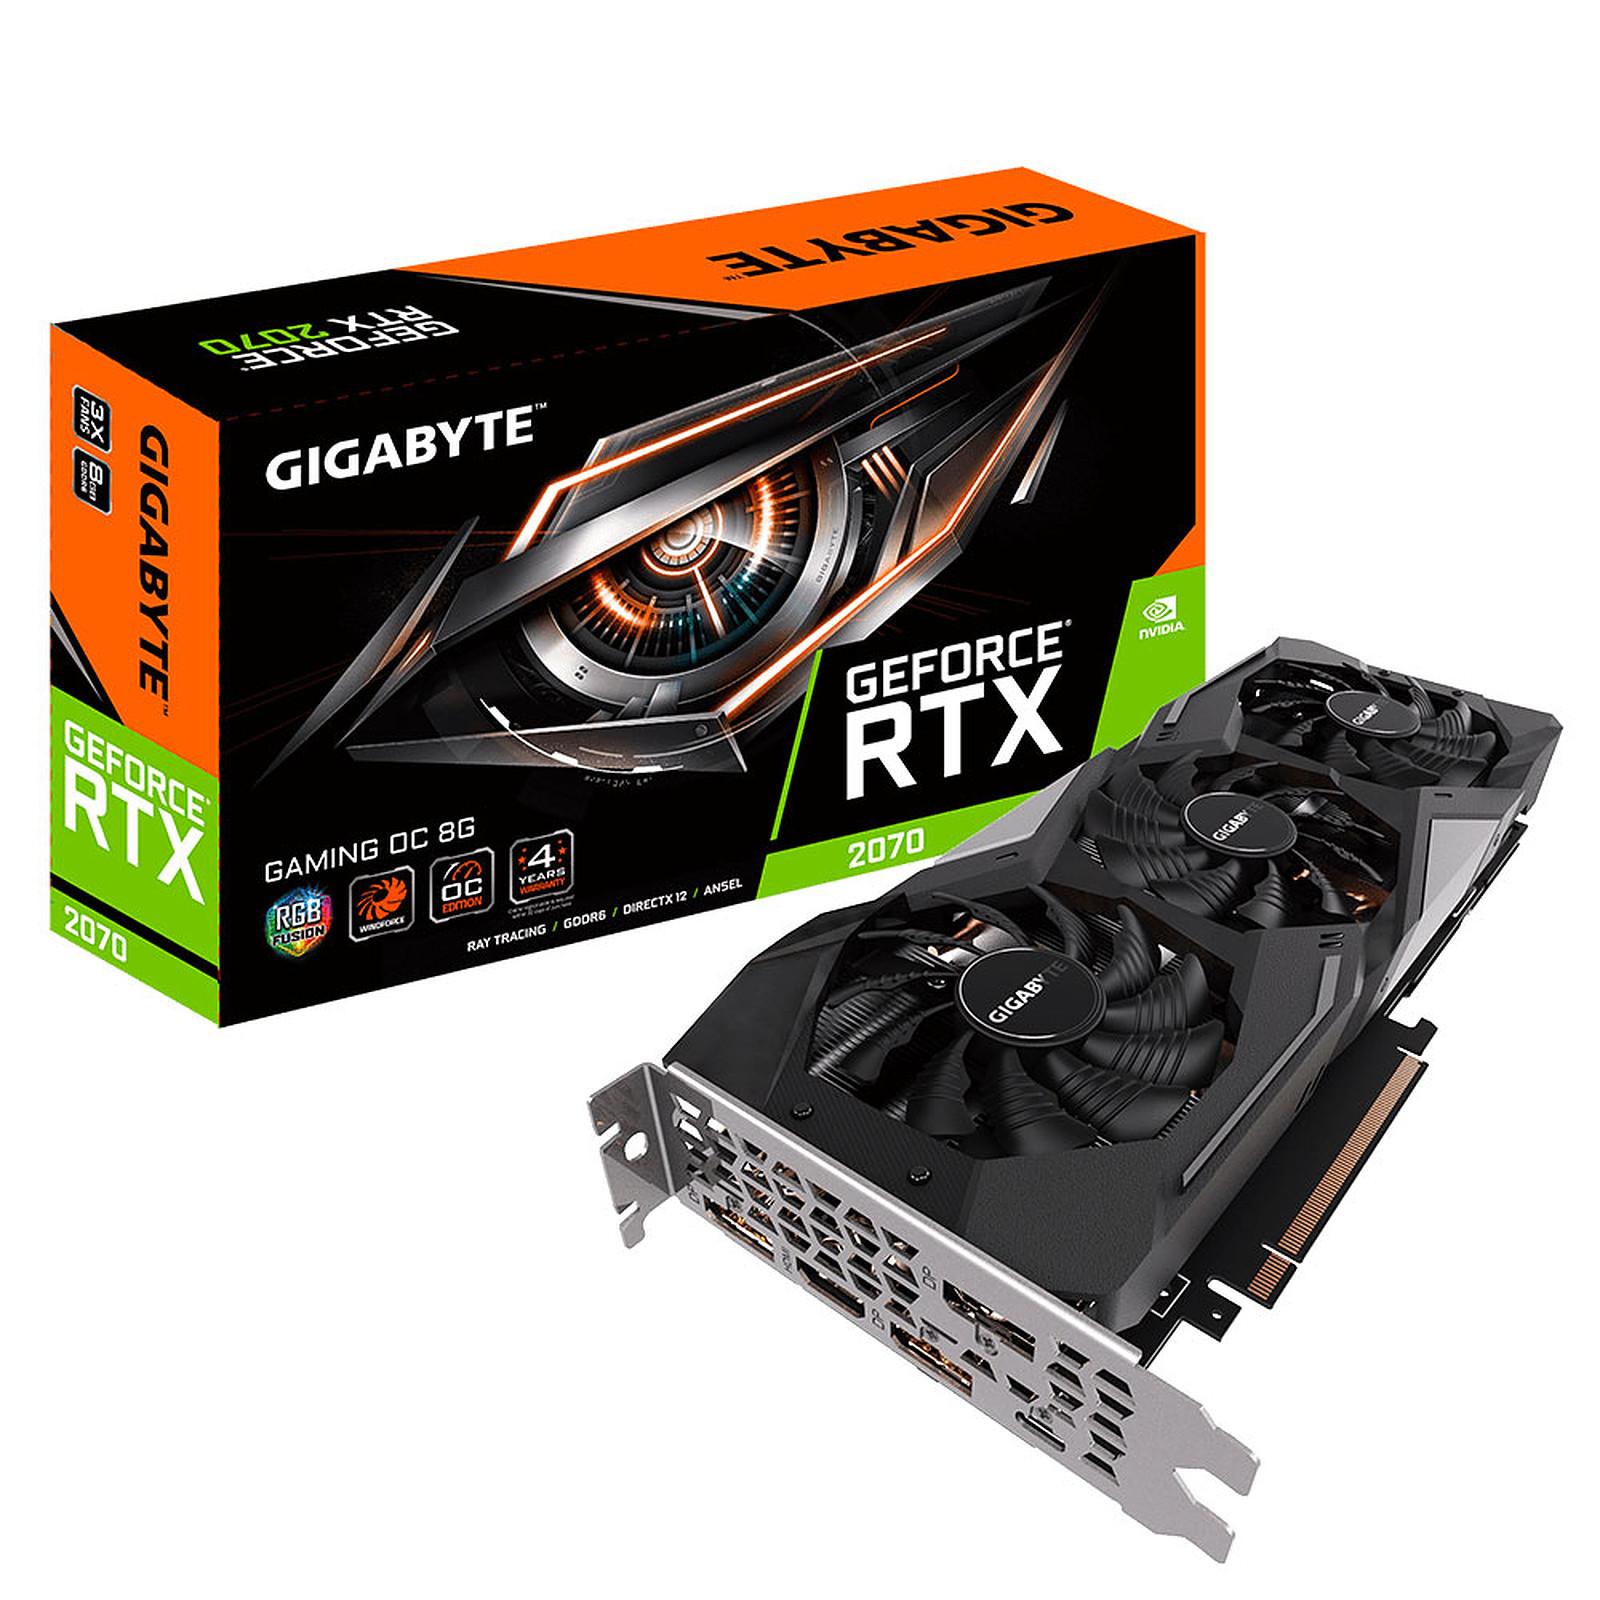 Tarjeta gráfica Gigabyte GeForce RTX 2070 WindForce 8G GDDR6